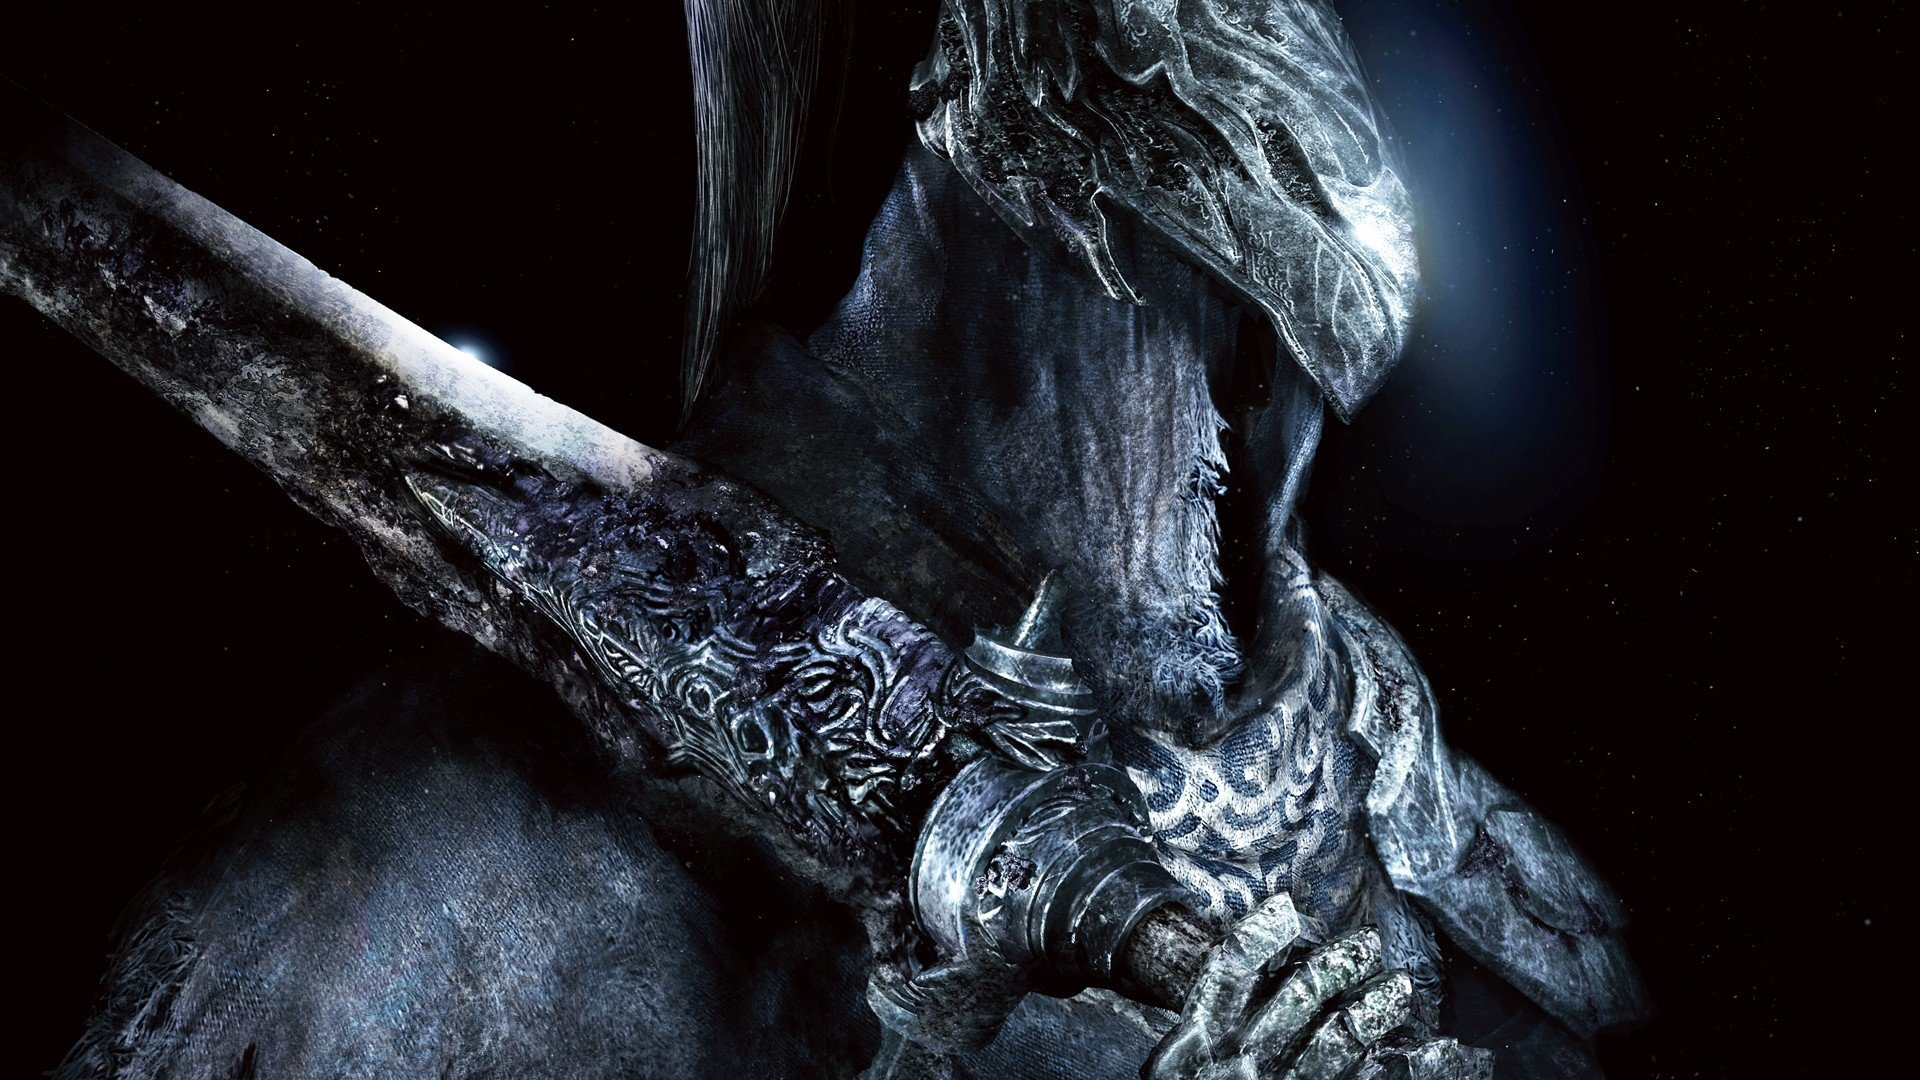 Dark Souls 2 Wallpapers Hd For Desktop Backgrounds